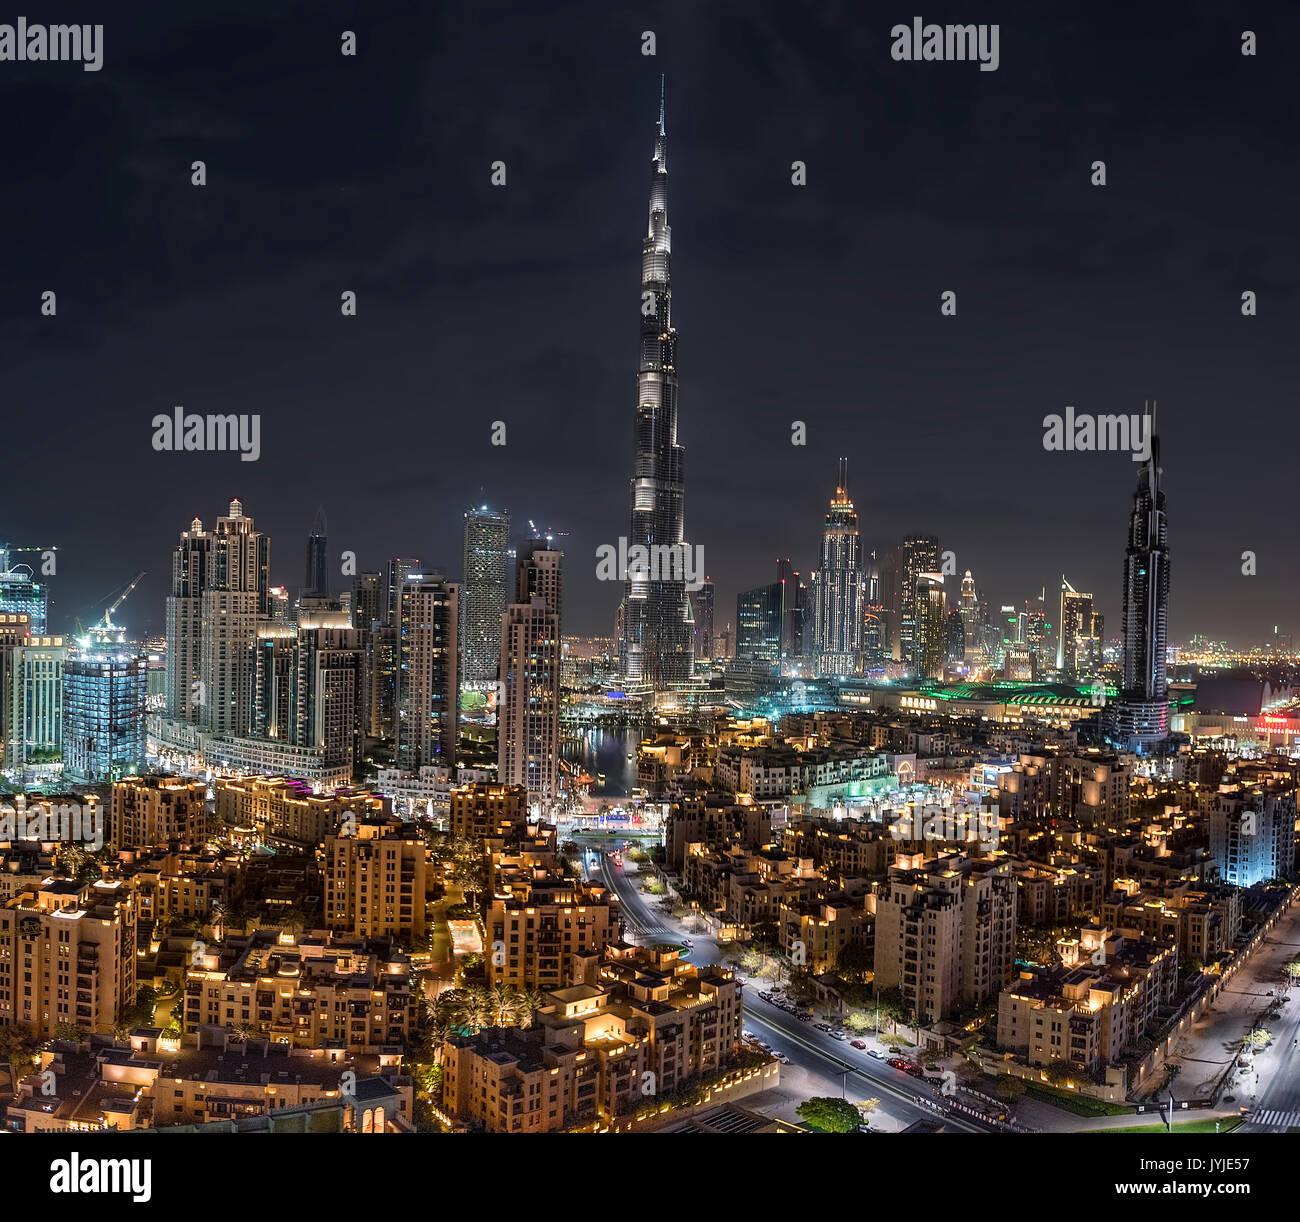 Dubai Downtown - Stock Image